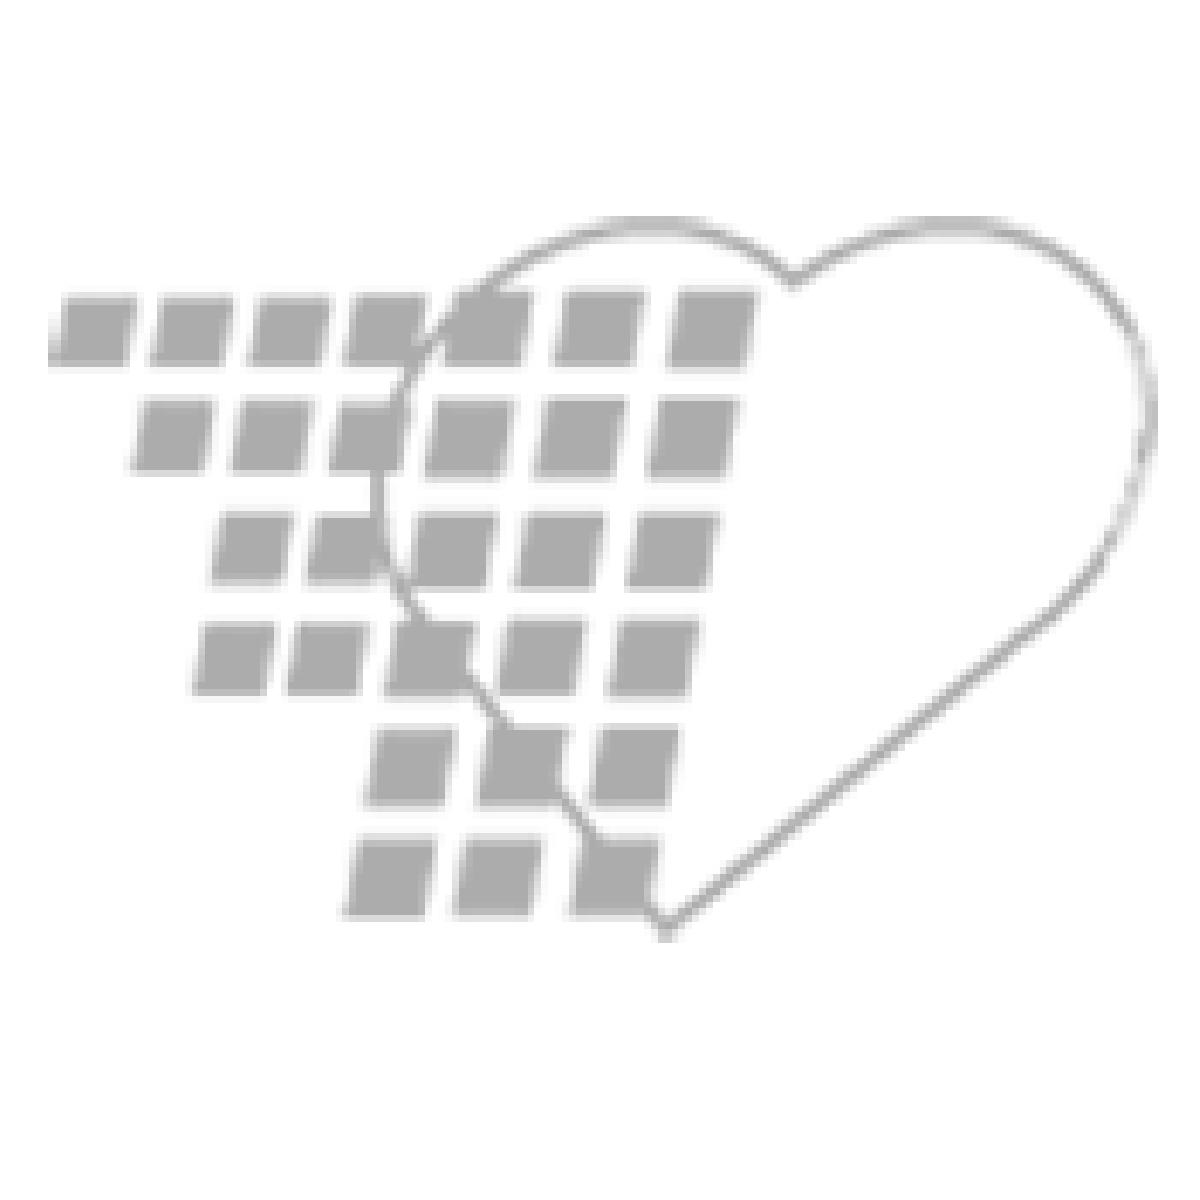 01-77-1075 Certified Nursing Assistant Pin